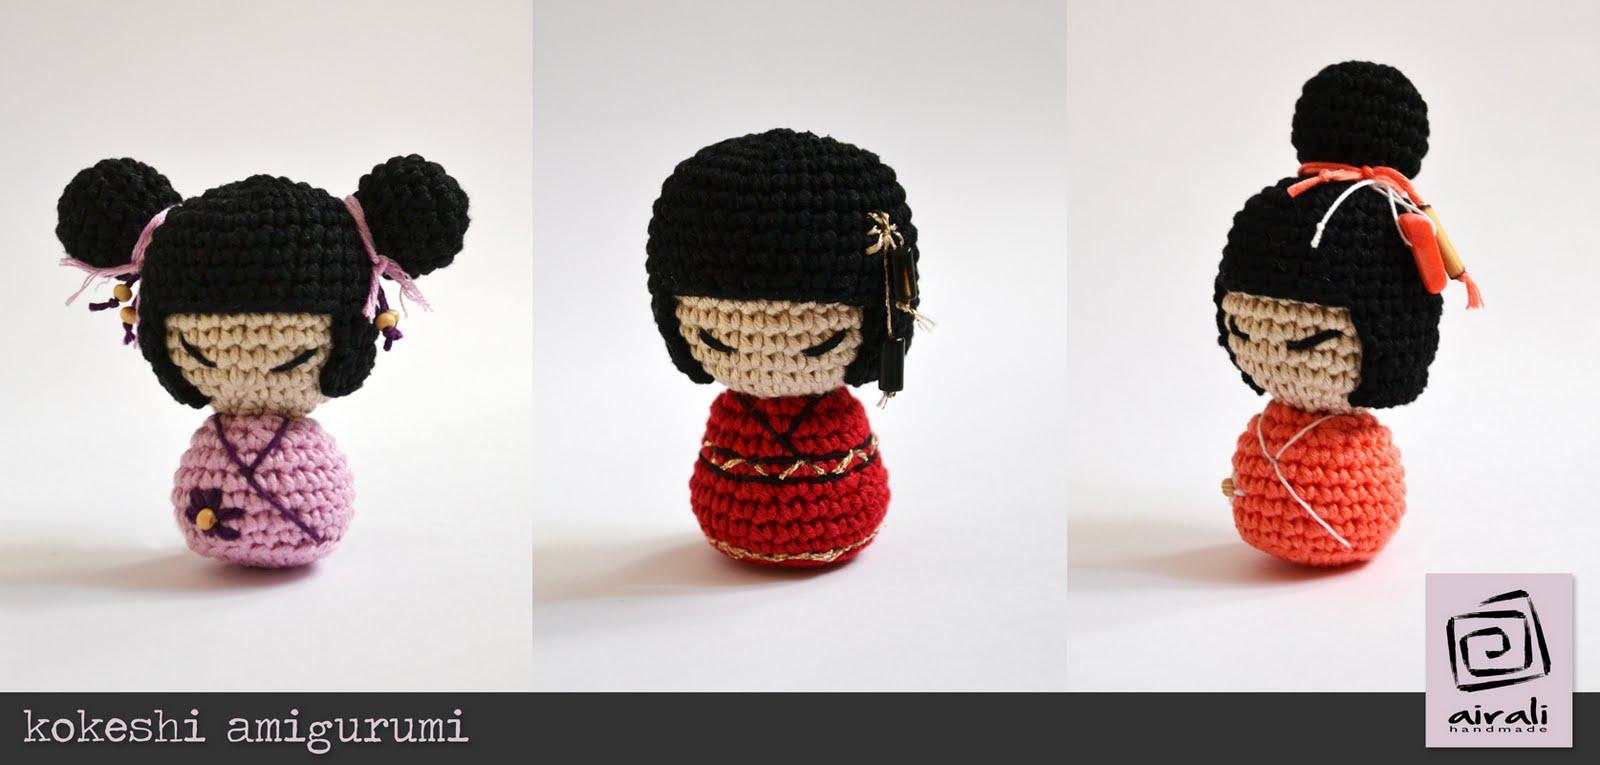 Kokeshi En Amigurumi : Airali design. Where is the Wonderland? Crochet, knit and ...